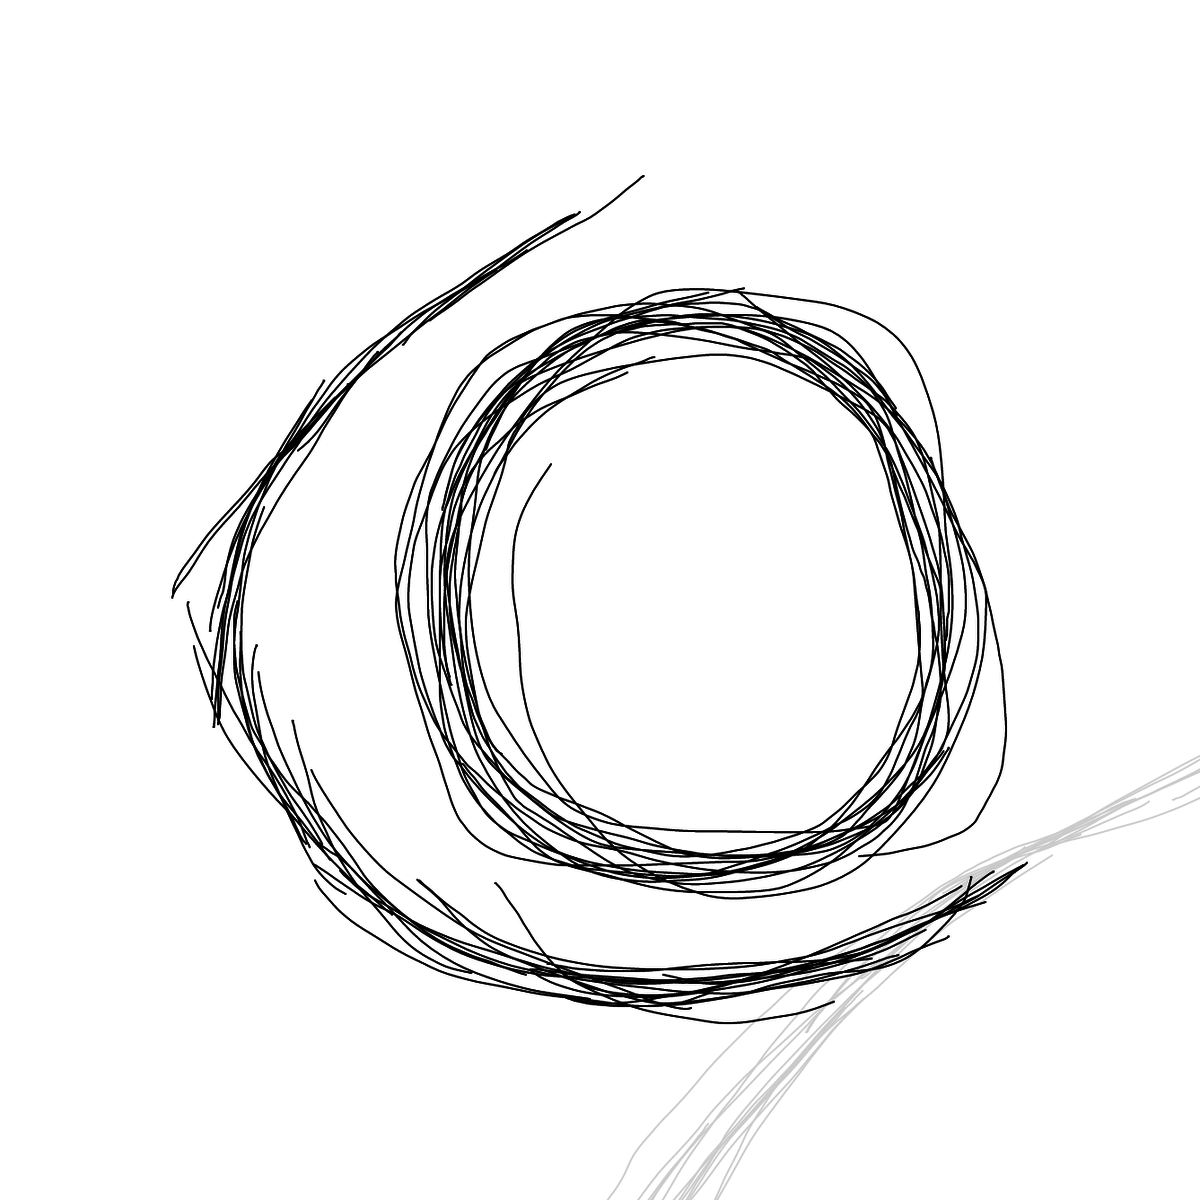 BAAAM drawing#18924 lat:-23.5477313995361330lng: -46.6356239318847660